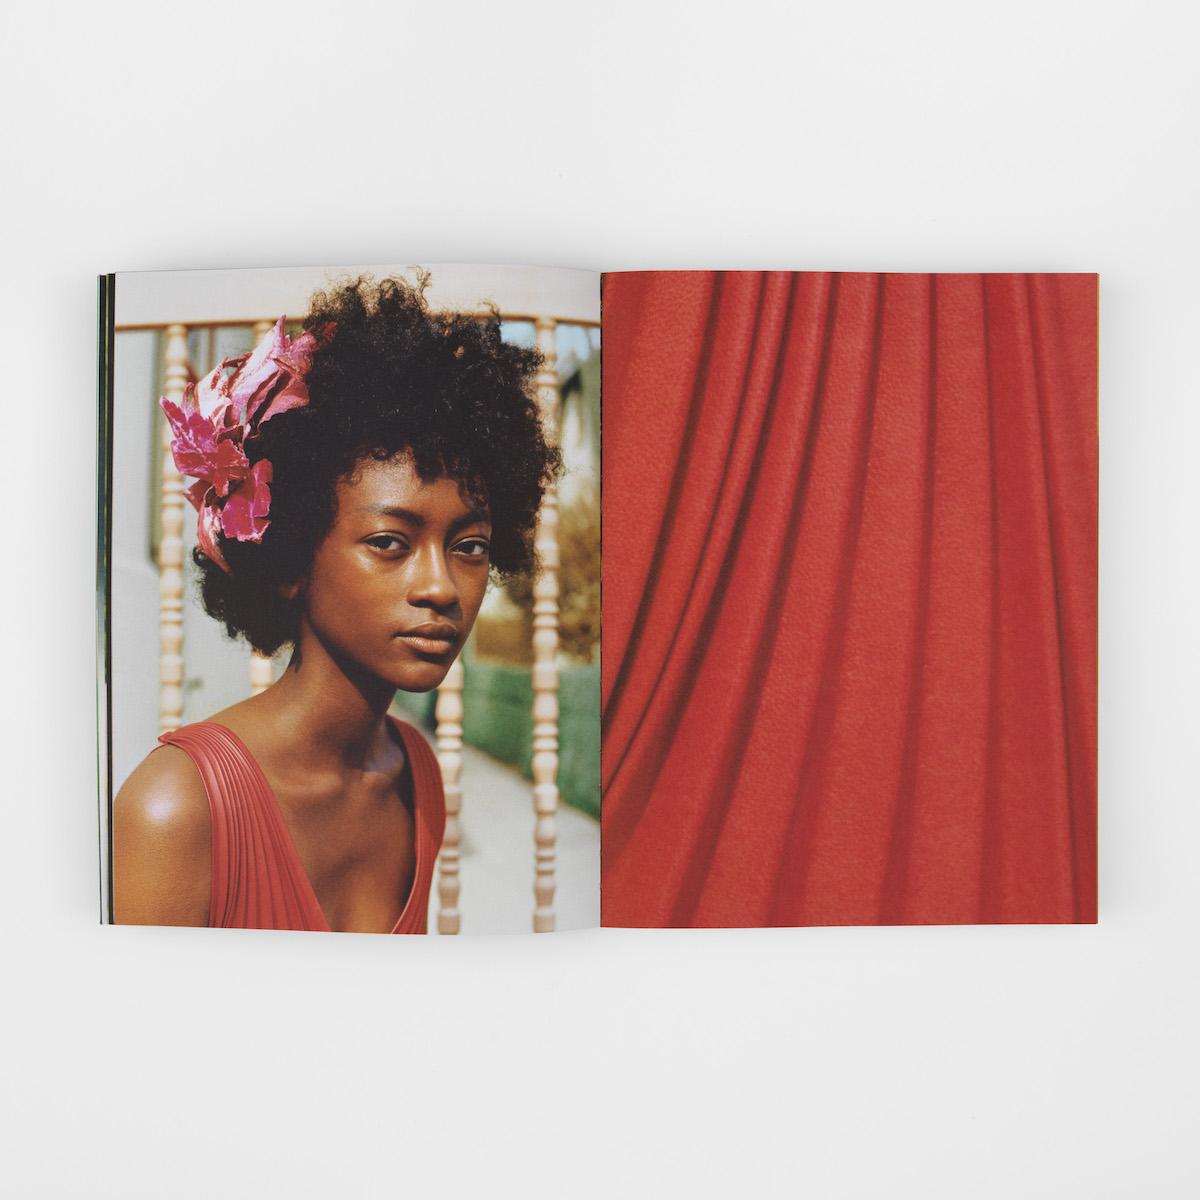 TyIer Mitchell, I Can Make You Feel Good, Untitled (Toni), 2019